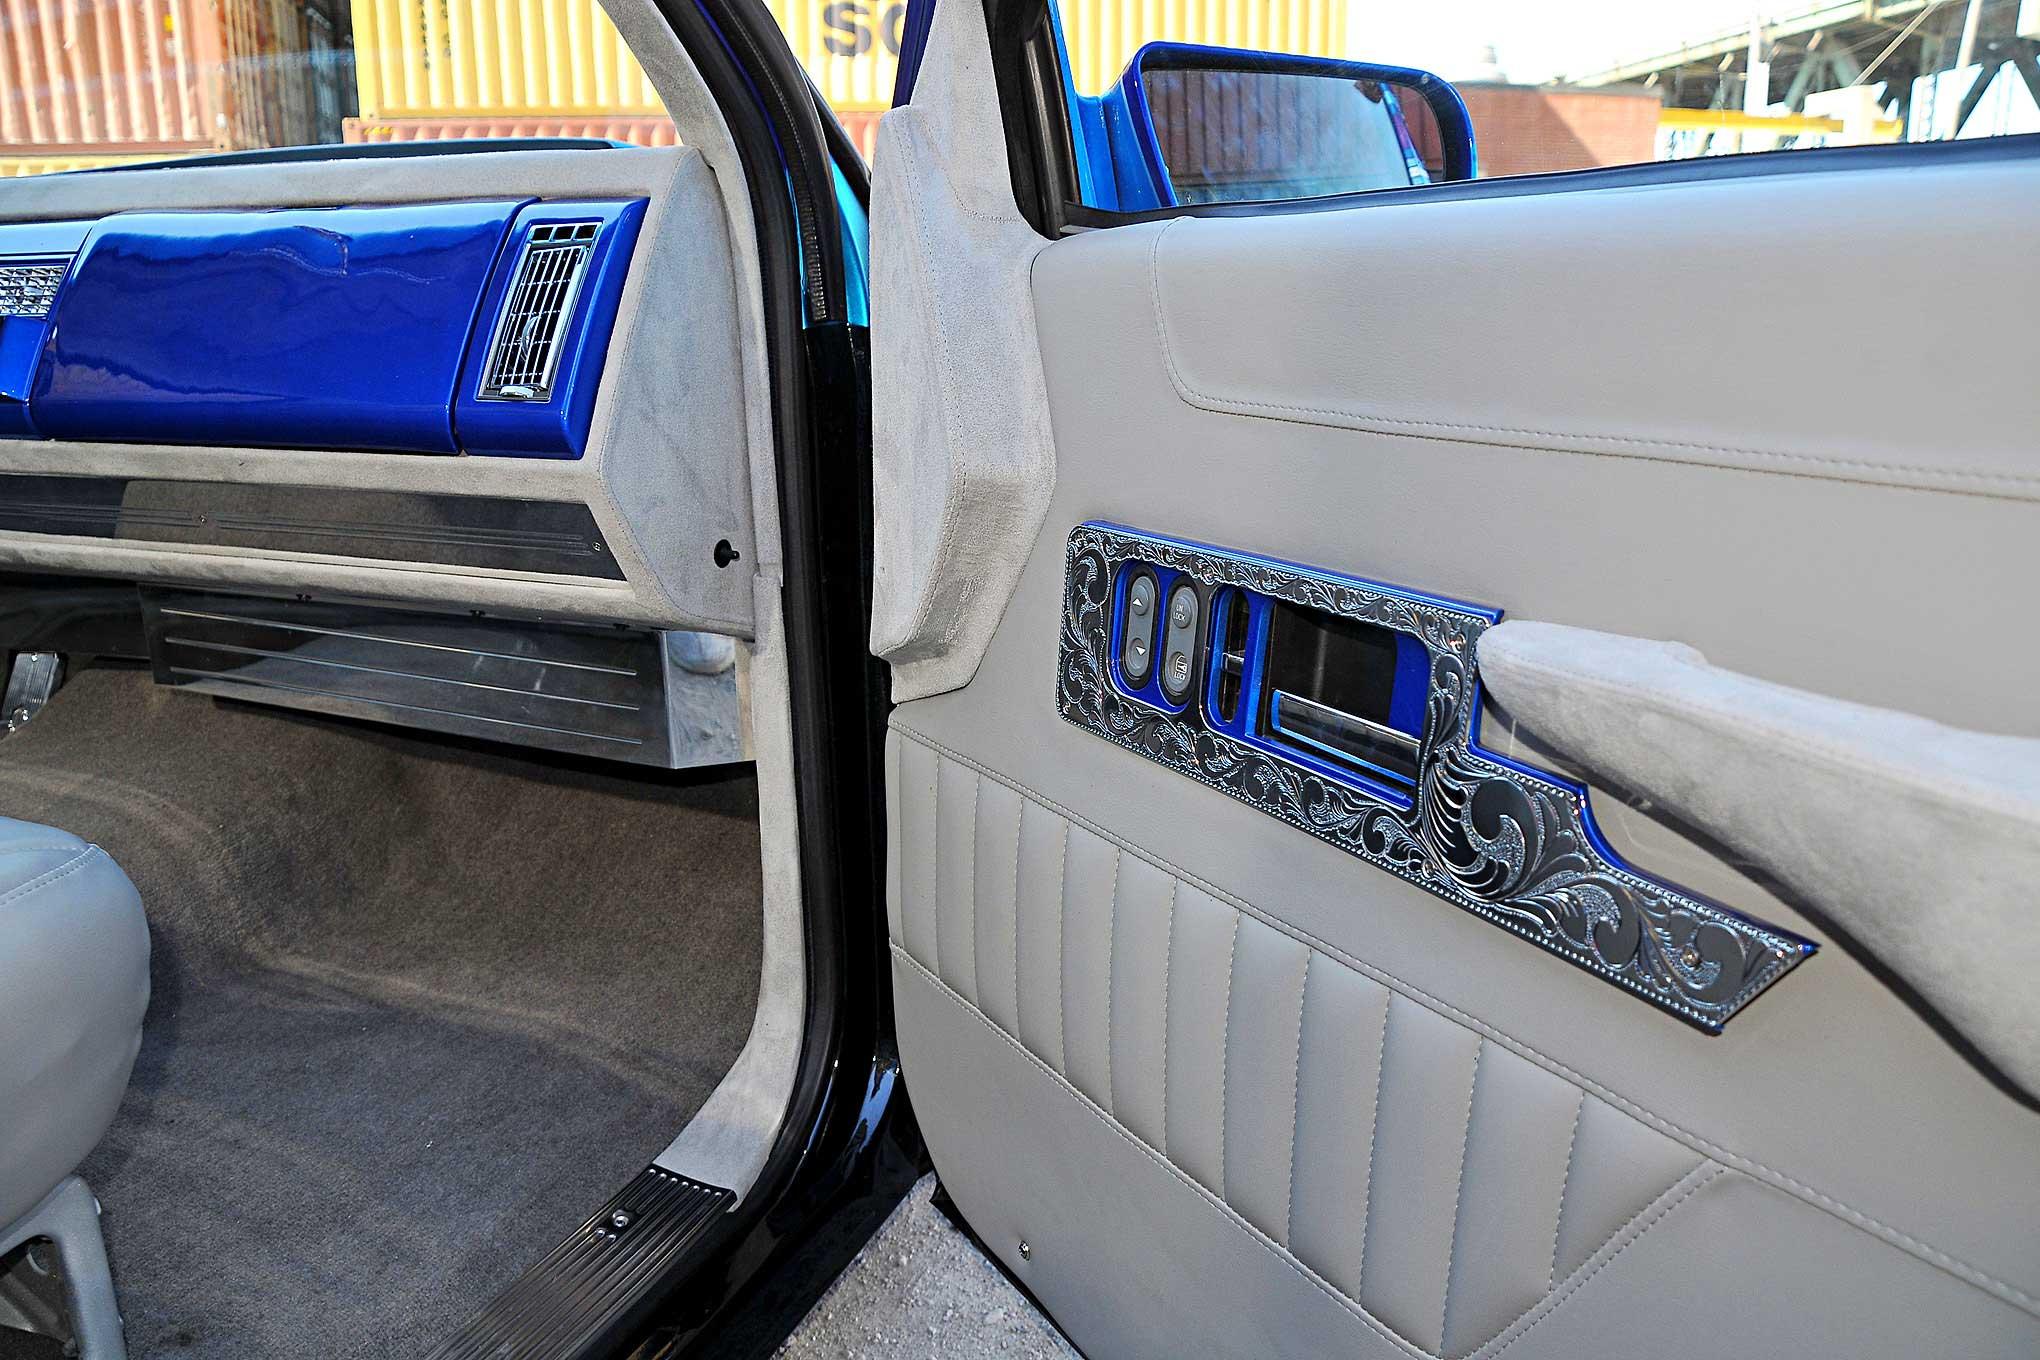 1992 Chevrolet 1500 Truckin Tuckin